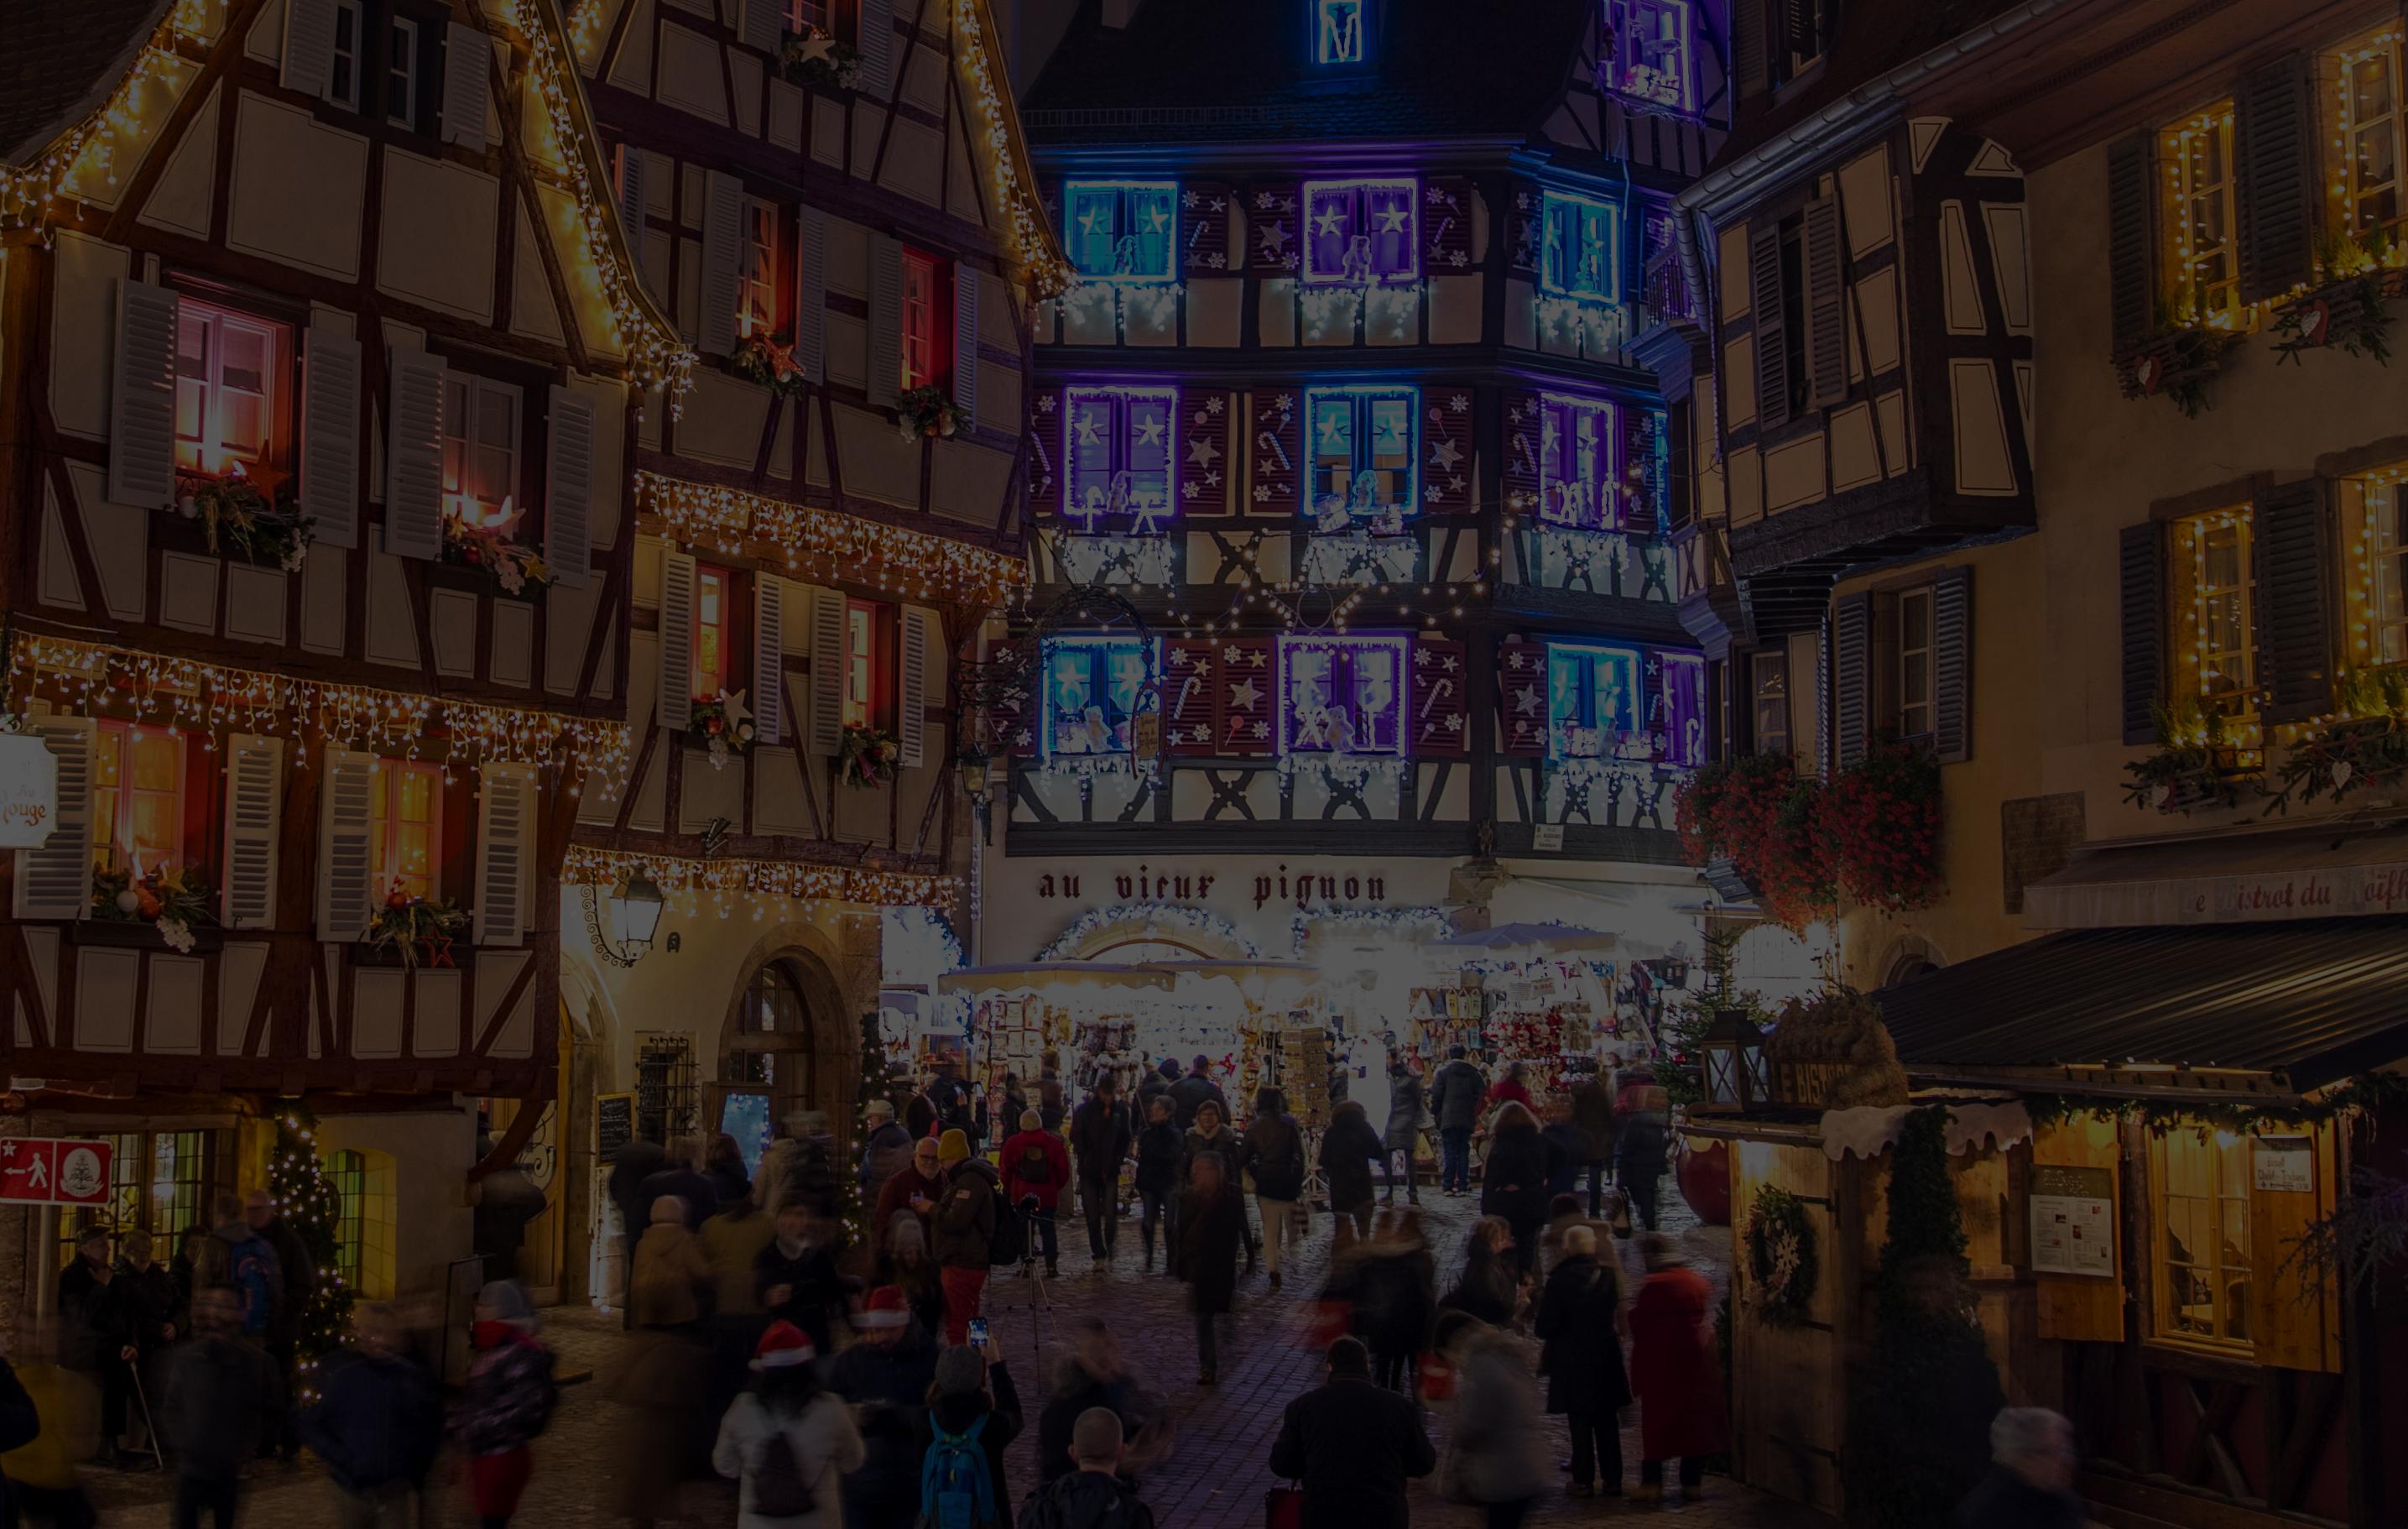 Illuminating Nativity On Tokay >> Travel Noel Tourism